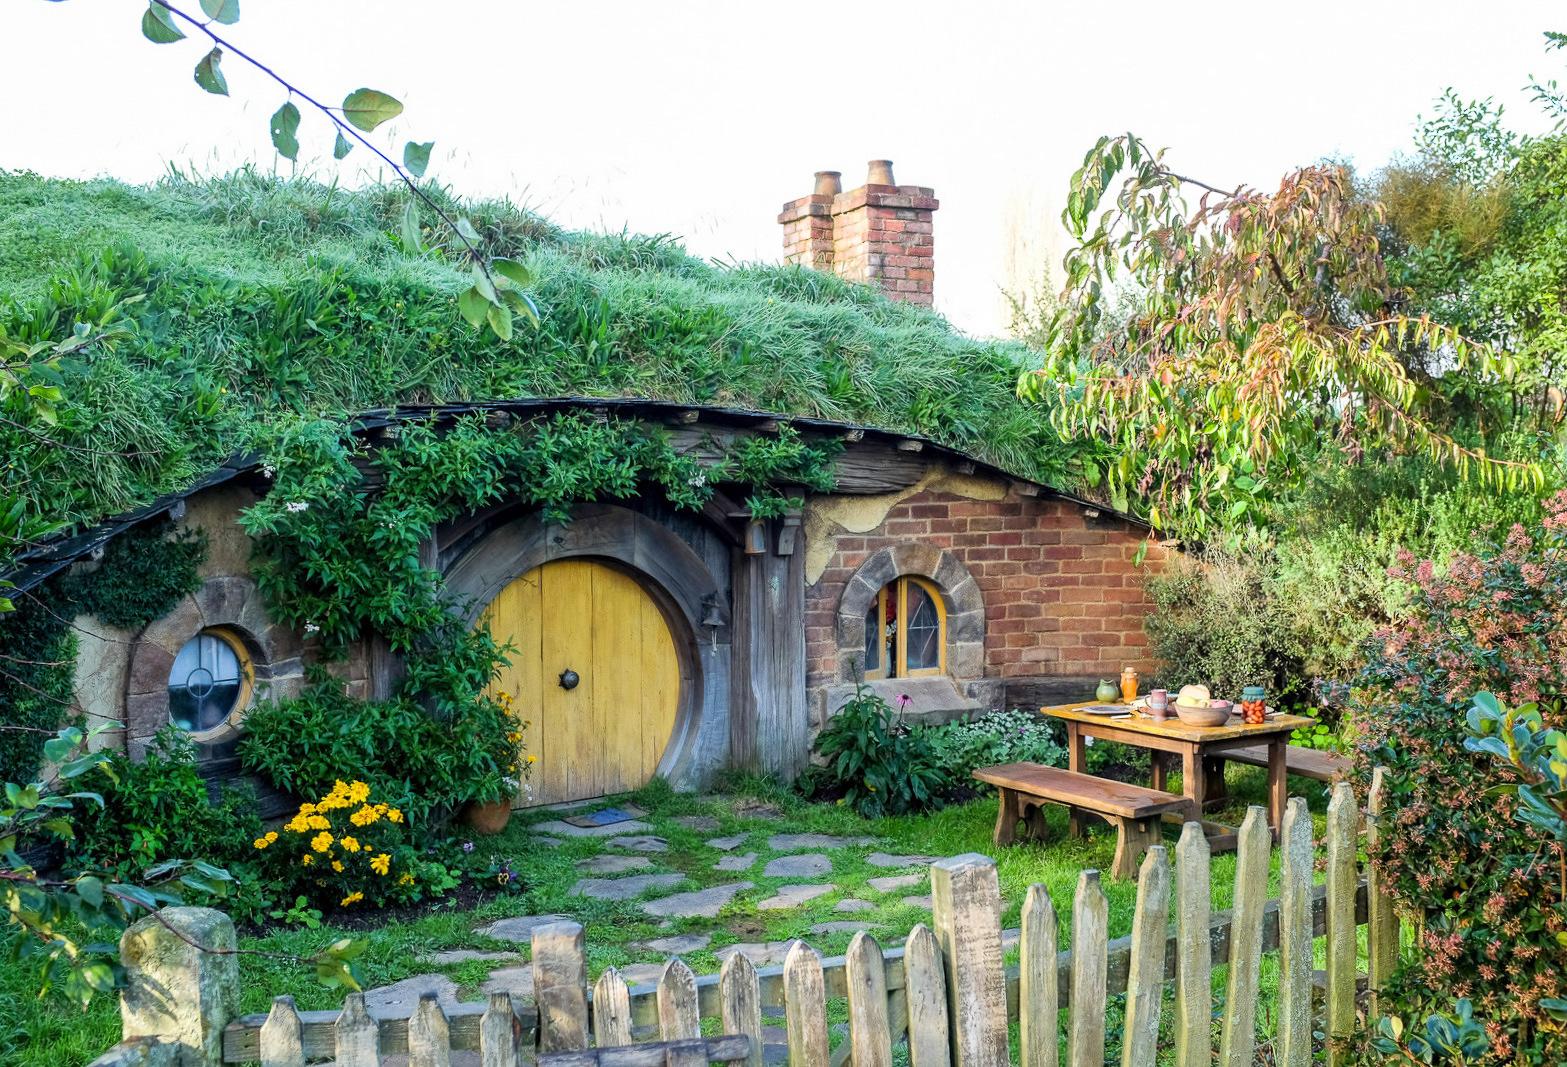 Eat Drink KL: The Green Dragon Inn @ Hobbiton